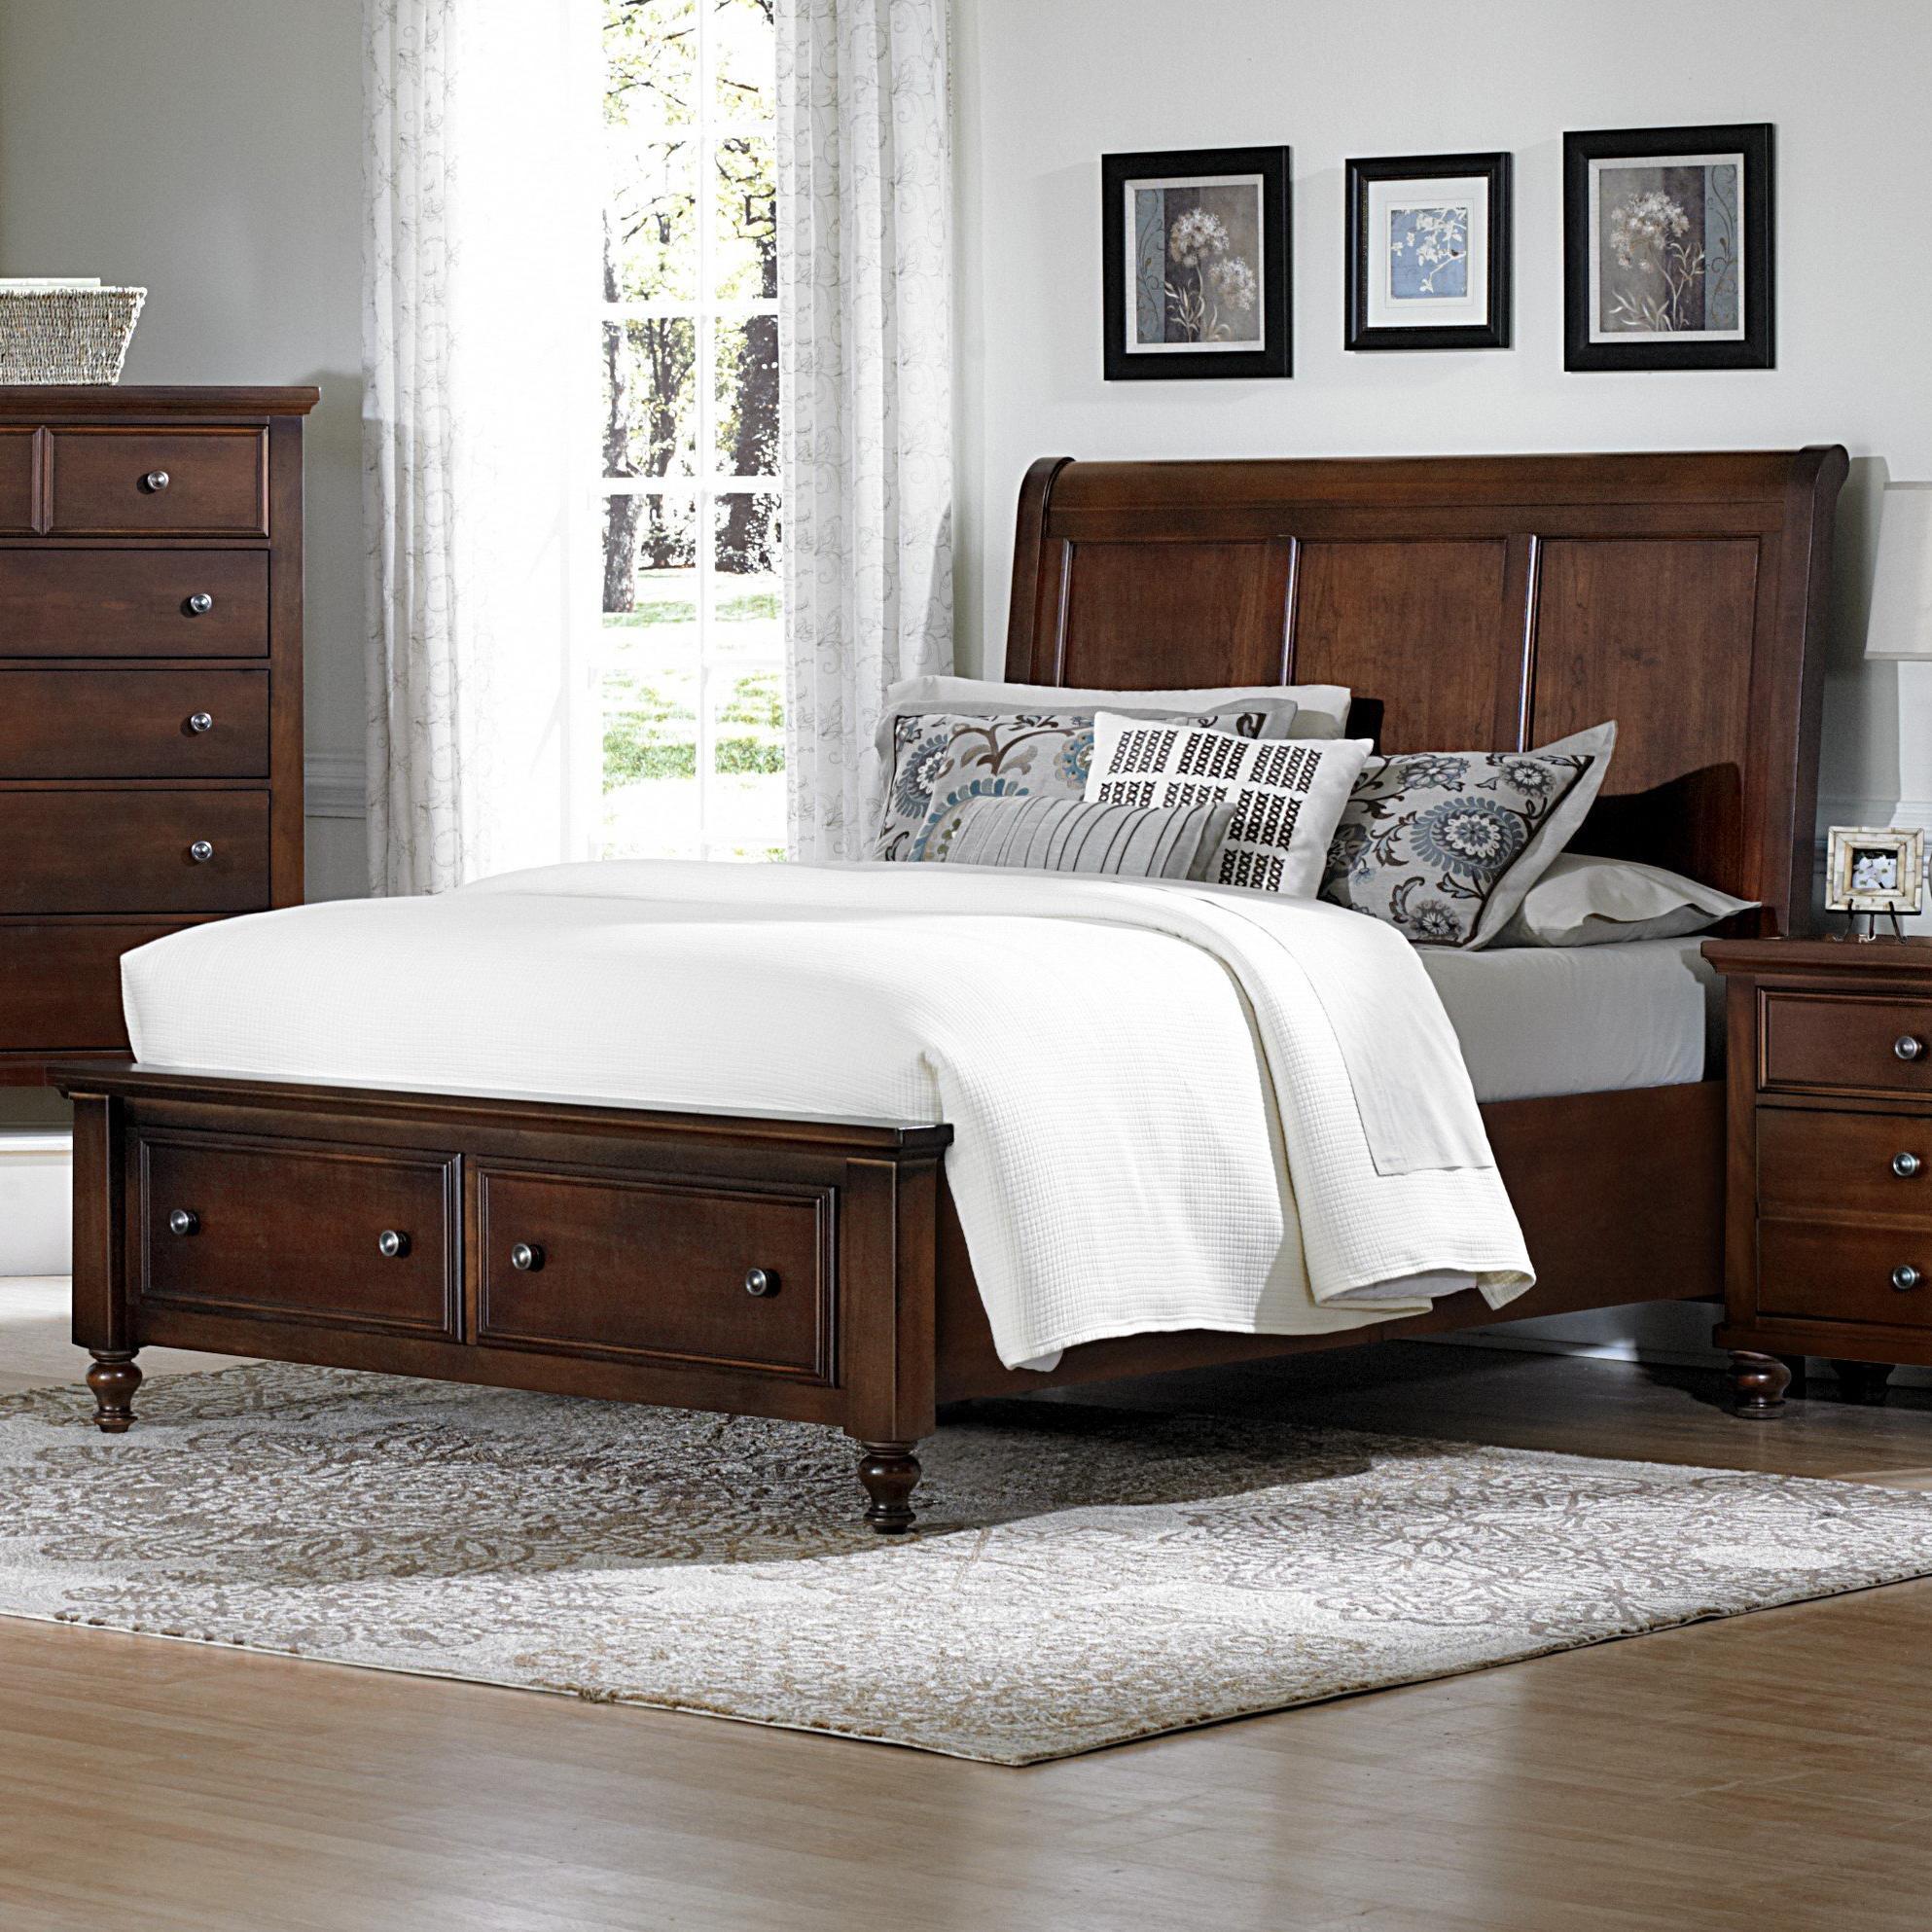 Vaughan Bassett Ellington Queen Sleigh Storage Bed - Item Number: 622-553+050B+502+555T